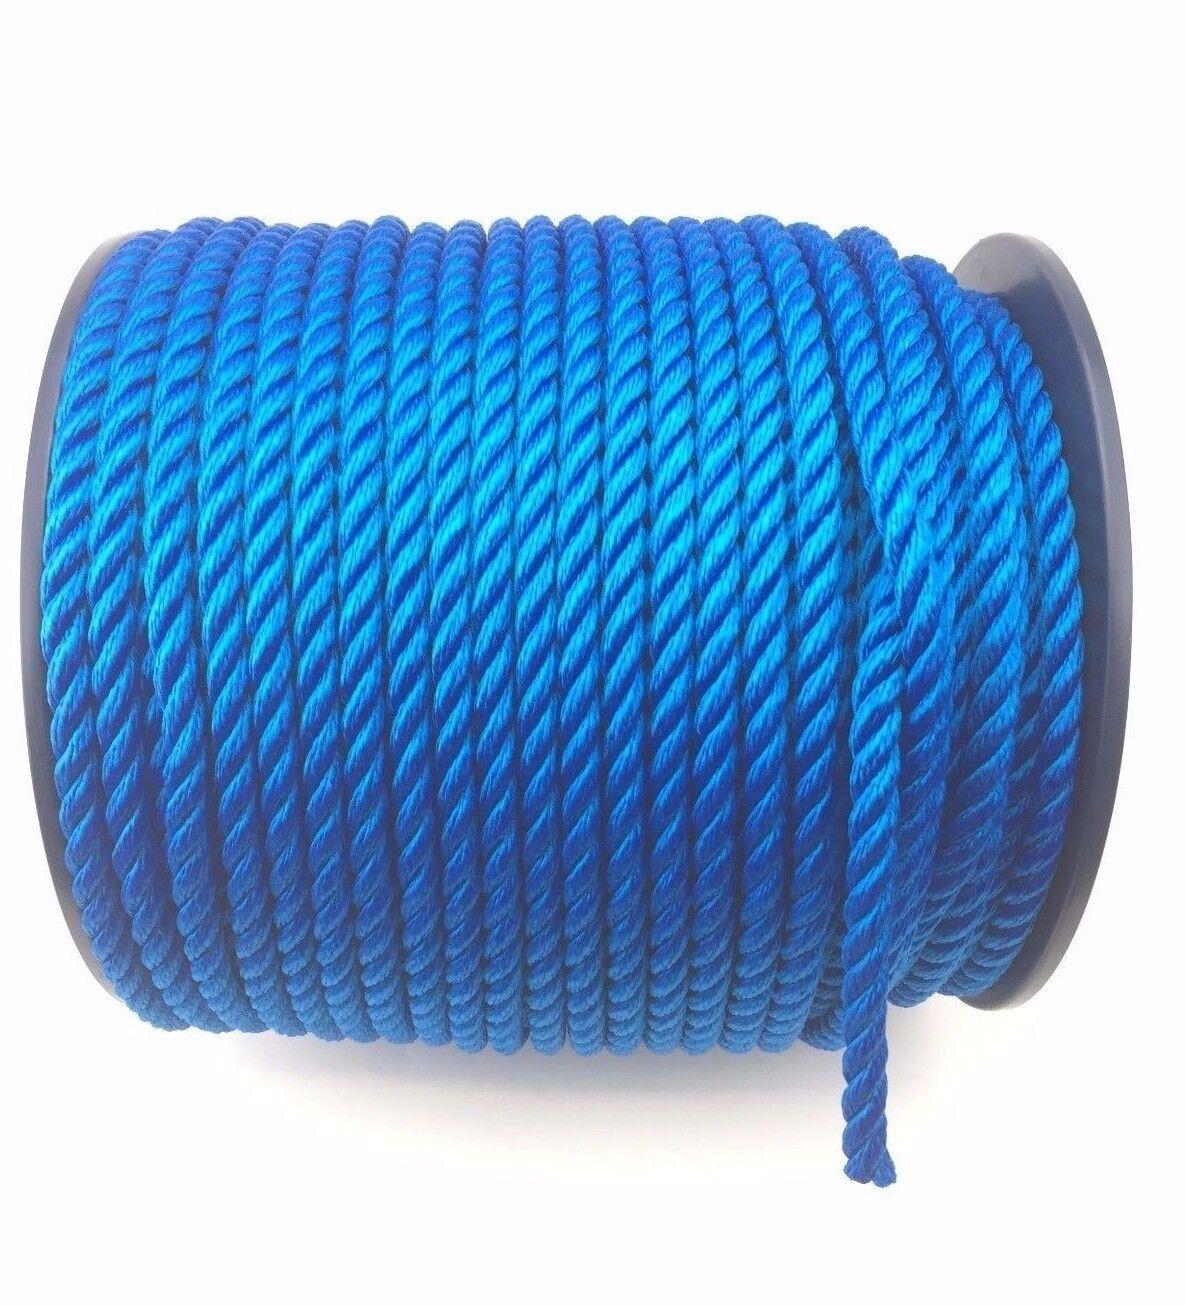 10mm Royal bluee Mooring Rope Softline x 220m Reel, Yachts Boats Marine Float